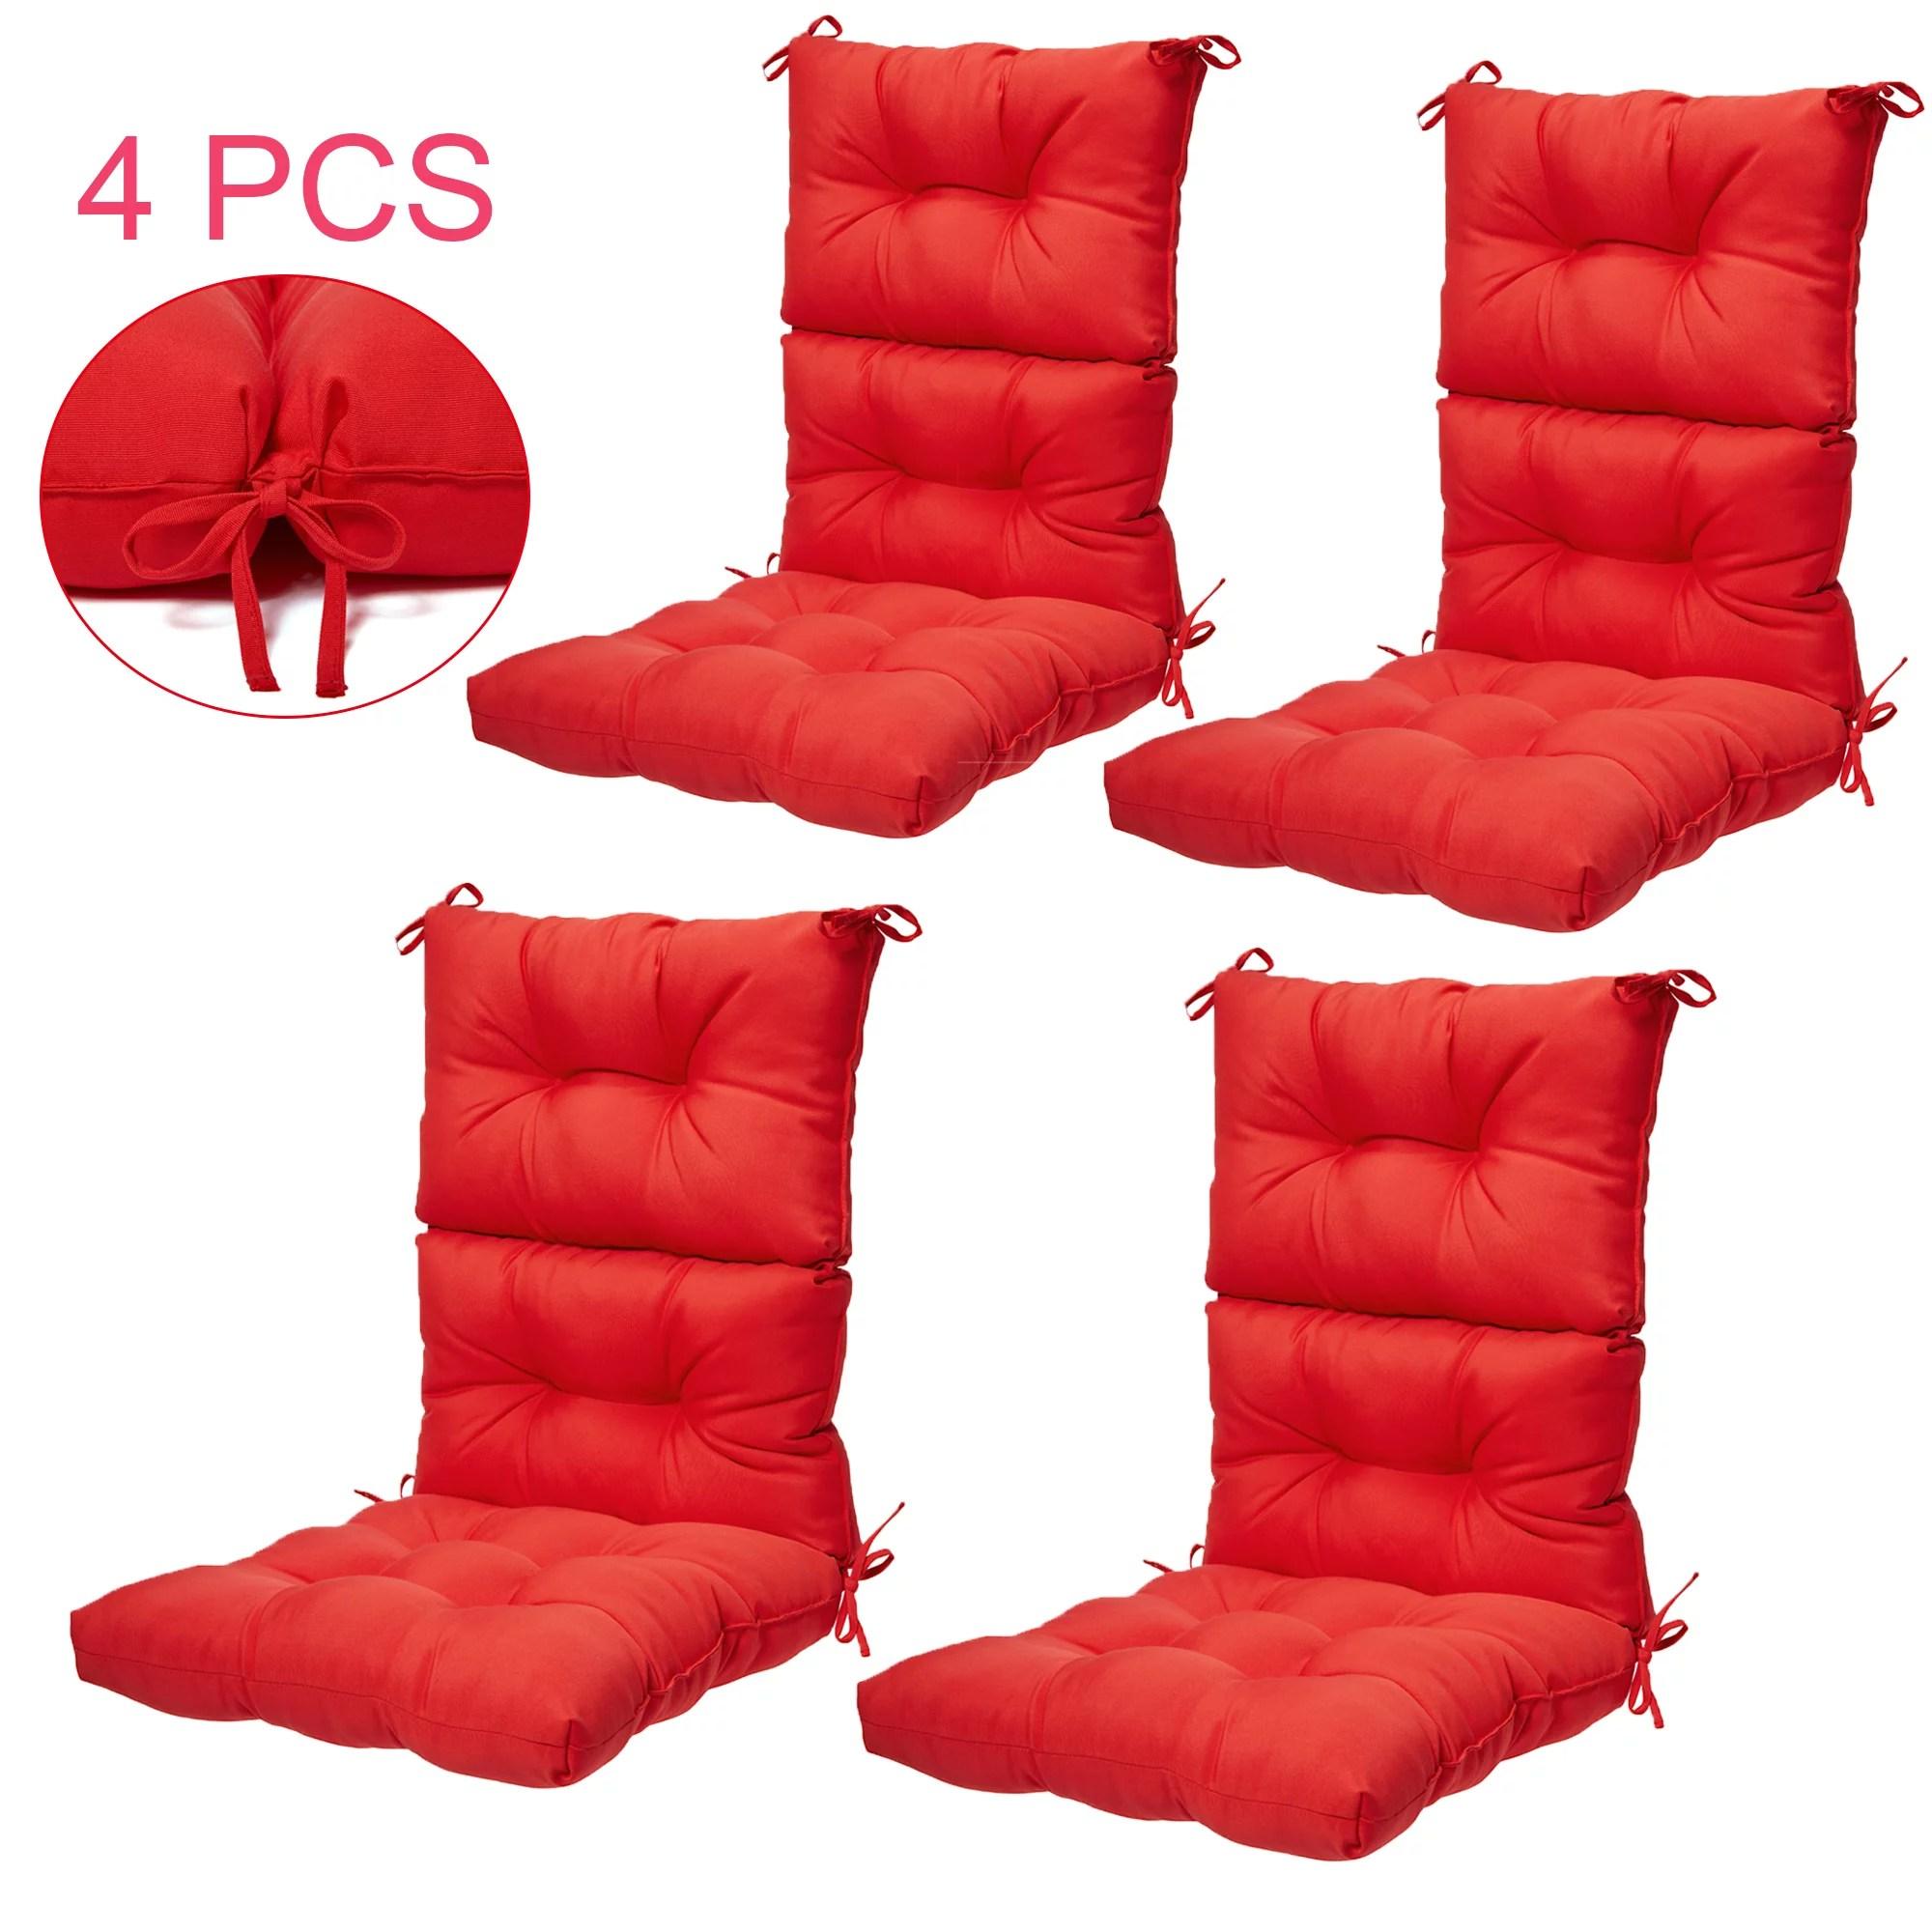 outdoor chair cushion 4pcs high back chair cushion high rebound foam high back chair cushions solid polyester chair cushion 44 x 21 in outdoor